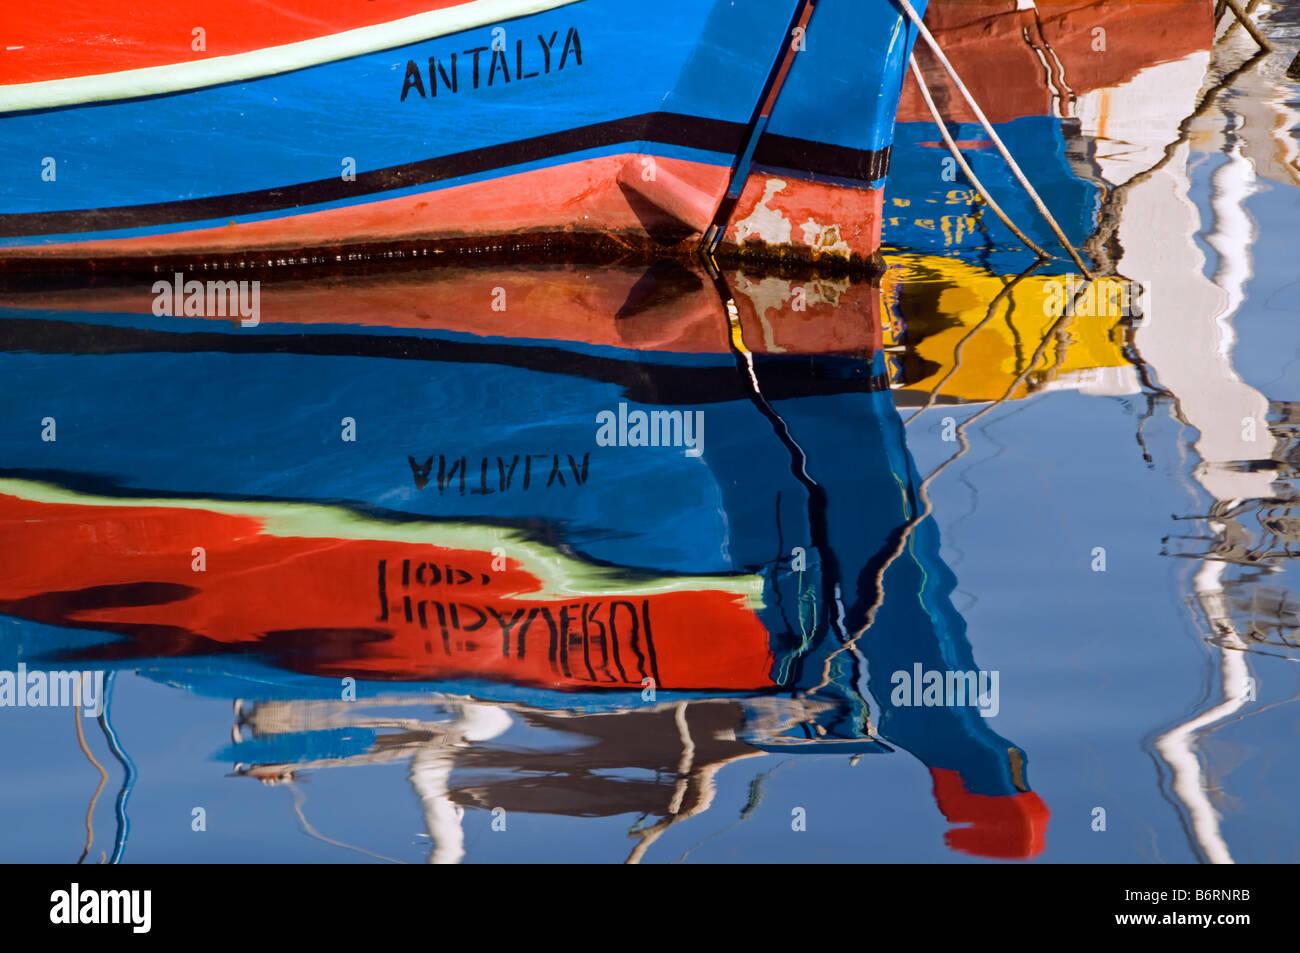 Reflection of fishing boat in Antalya Harbor - Stock Image